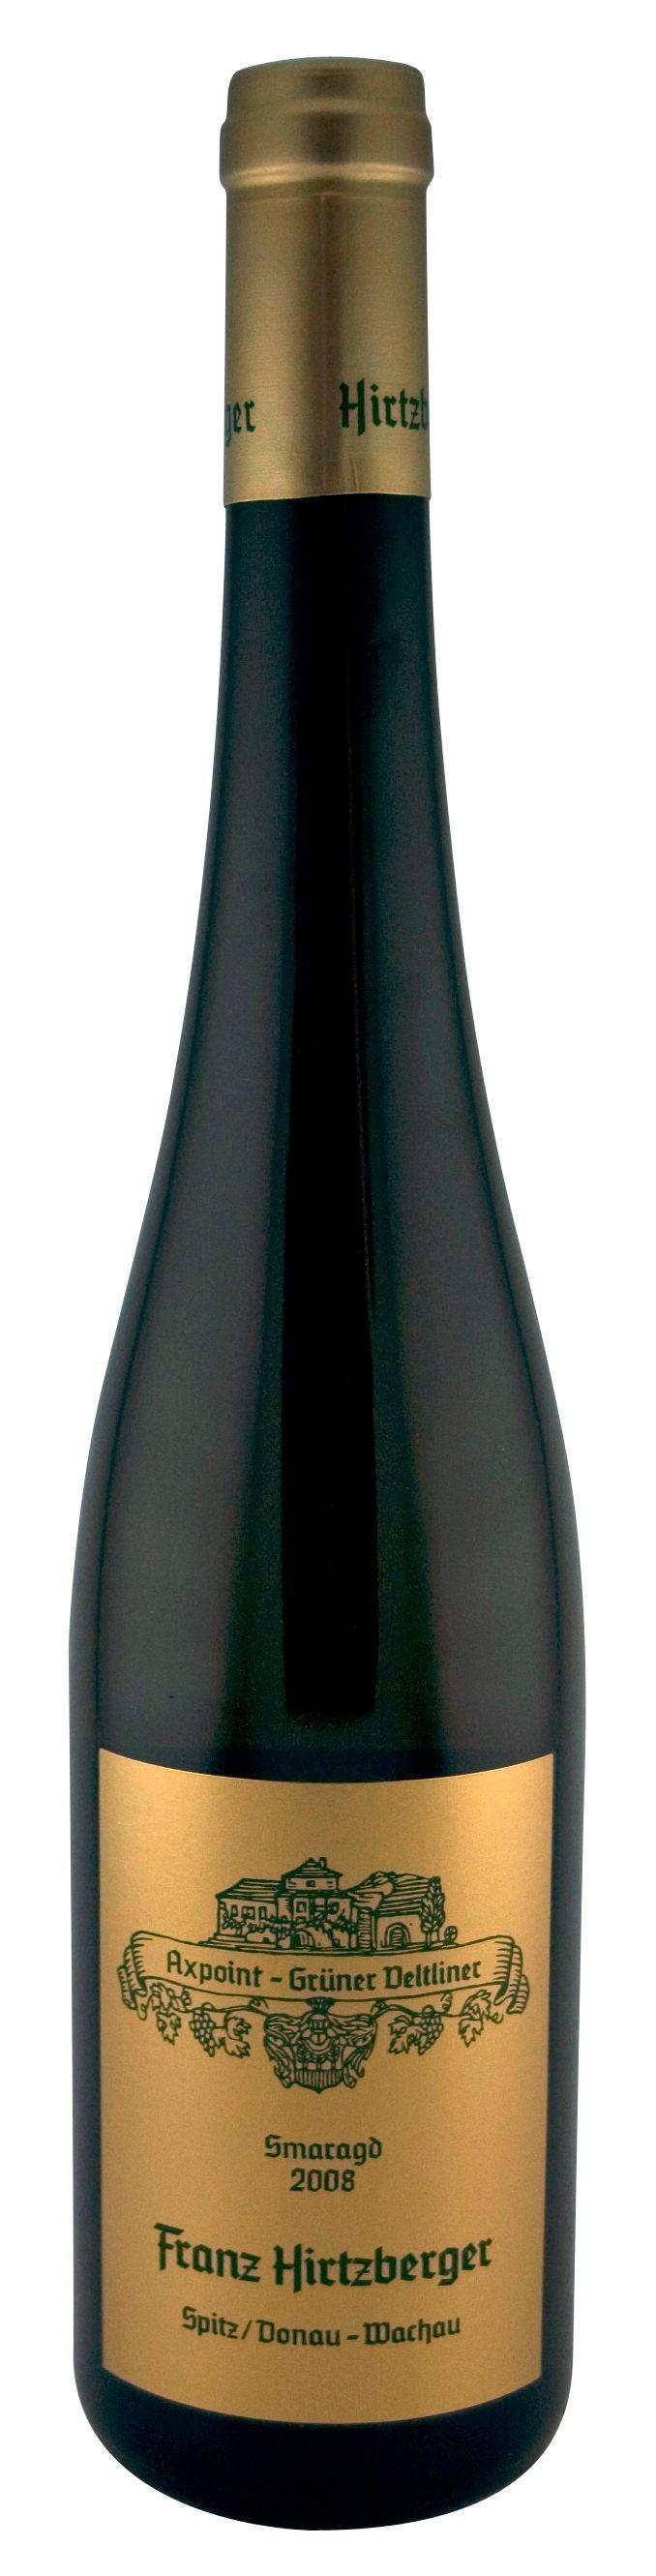 Hirtzberger - Grüner Veltliner Smaragd Axpoint, 2015